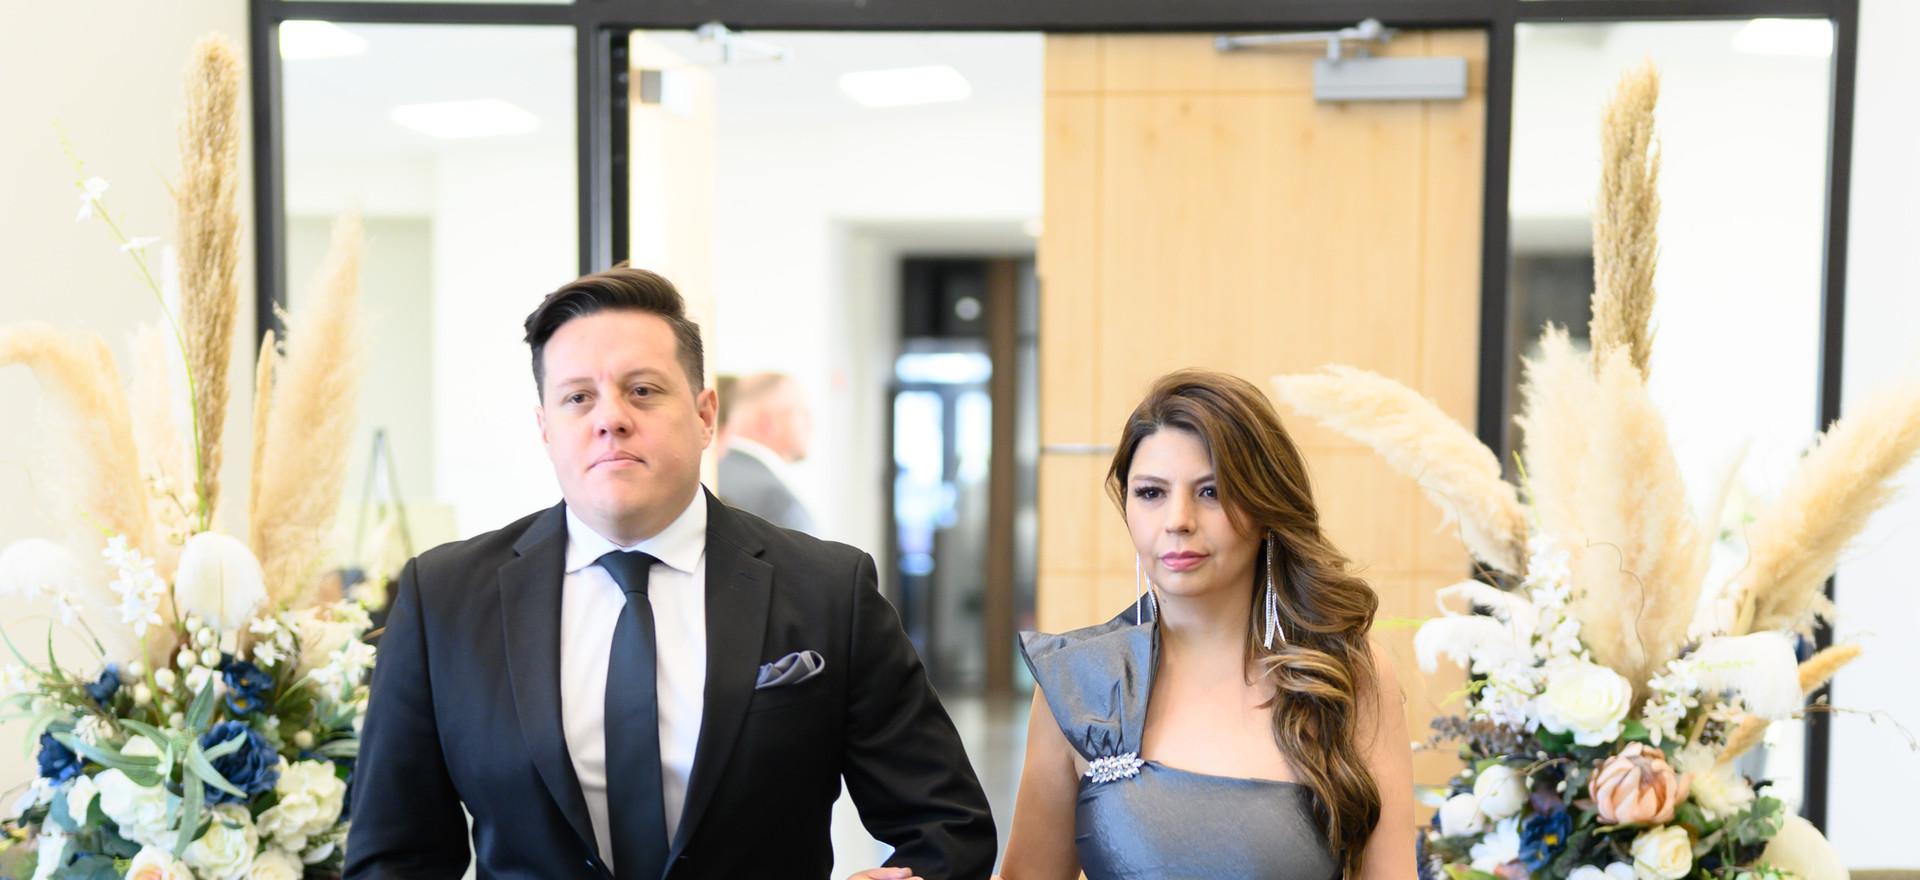 046_Lorena and Mike's Wedding day.jpg